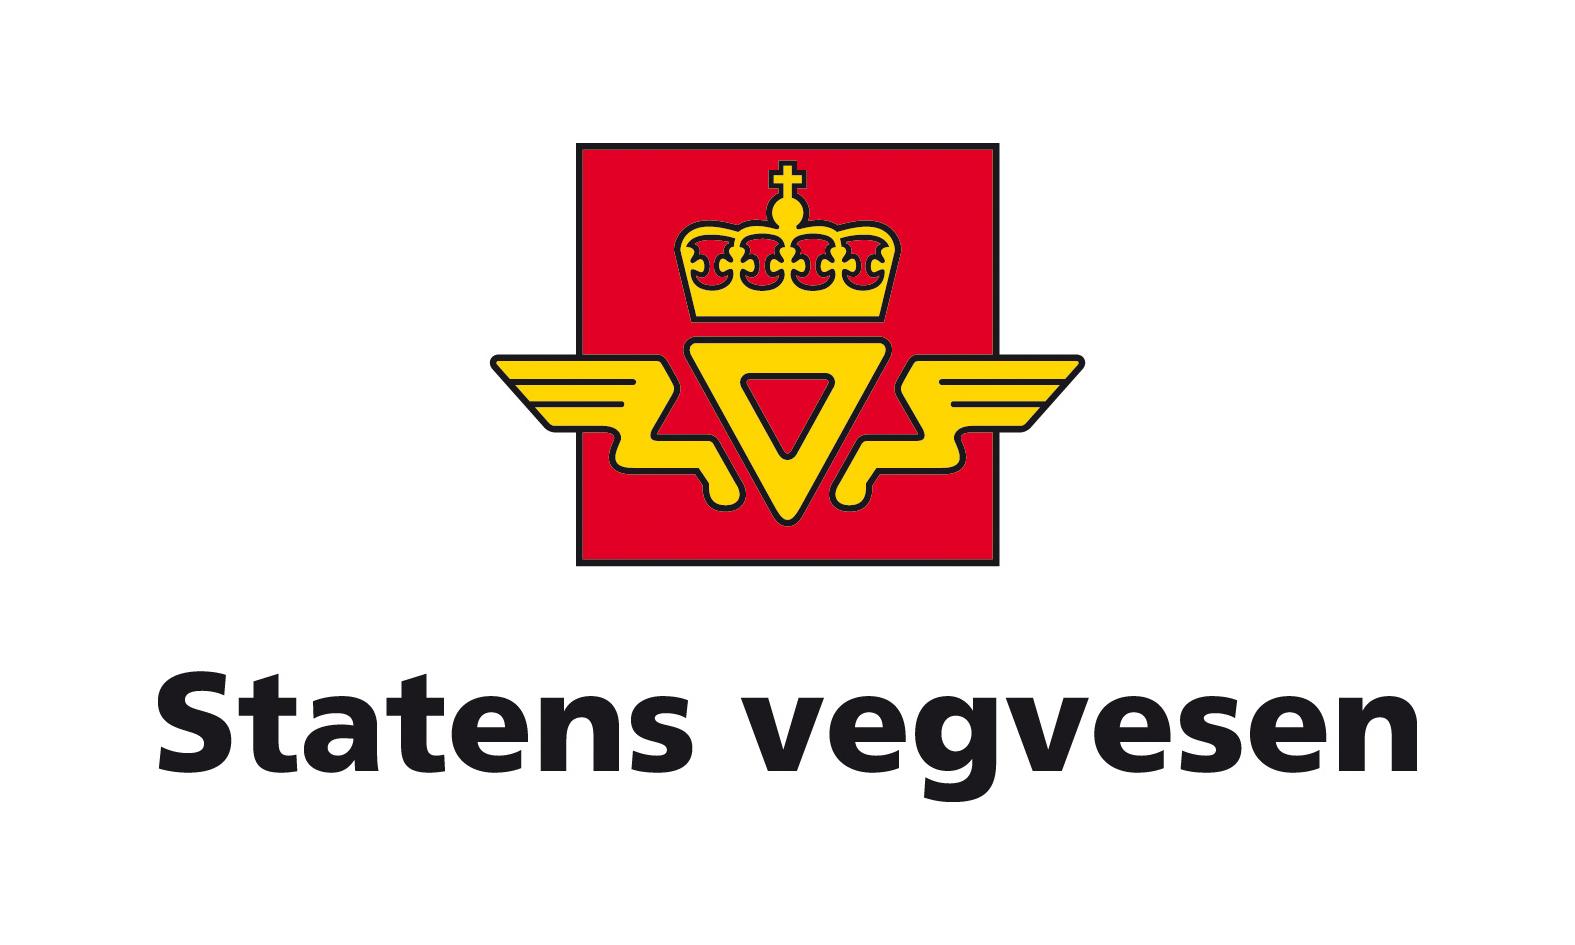 Statens vegvesen